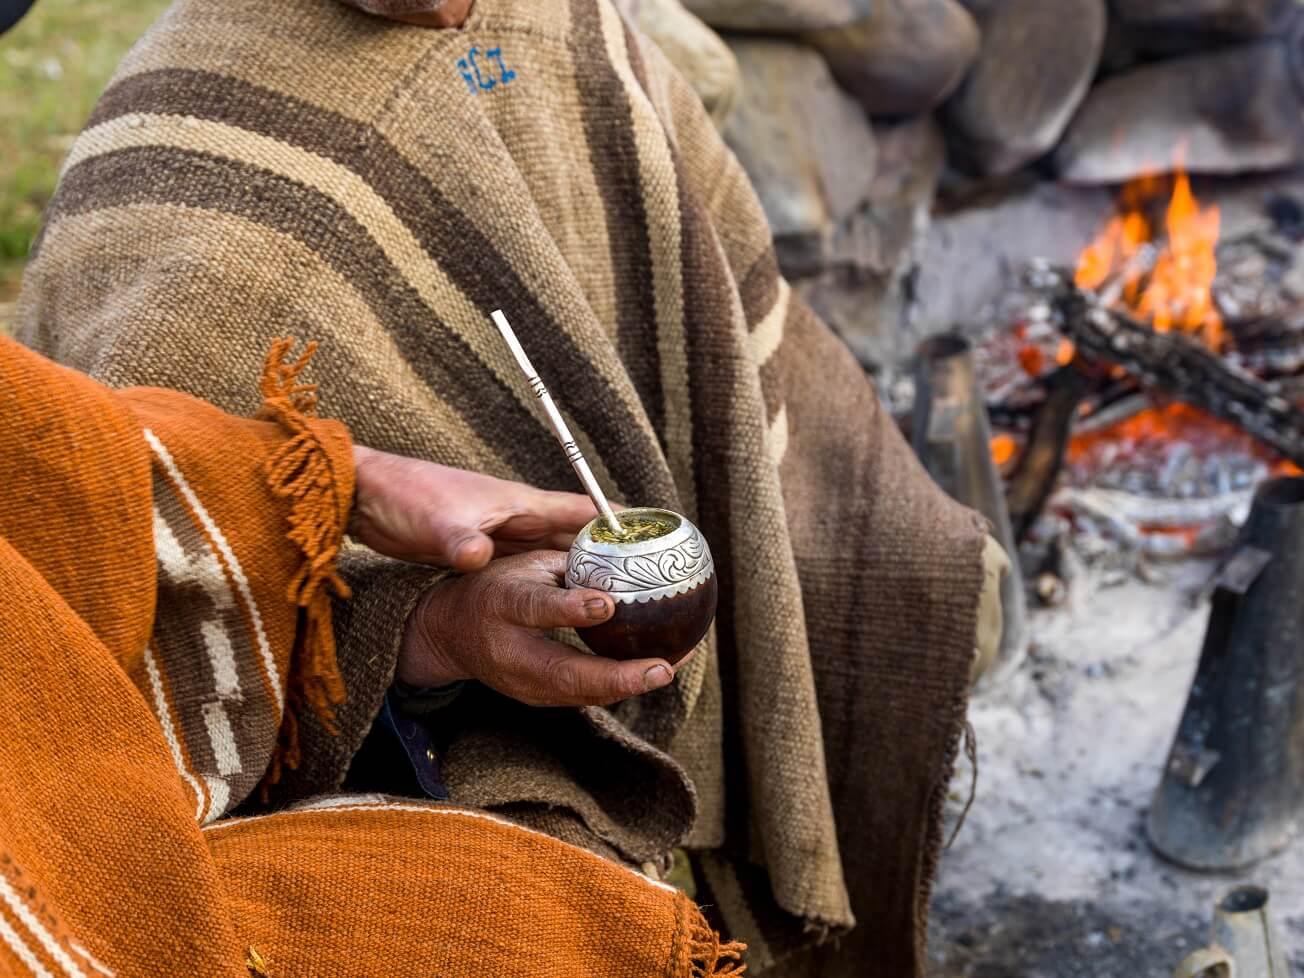 Gaucho Drinking Mate, lateinamerikanische Kulturtradition.